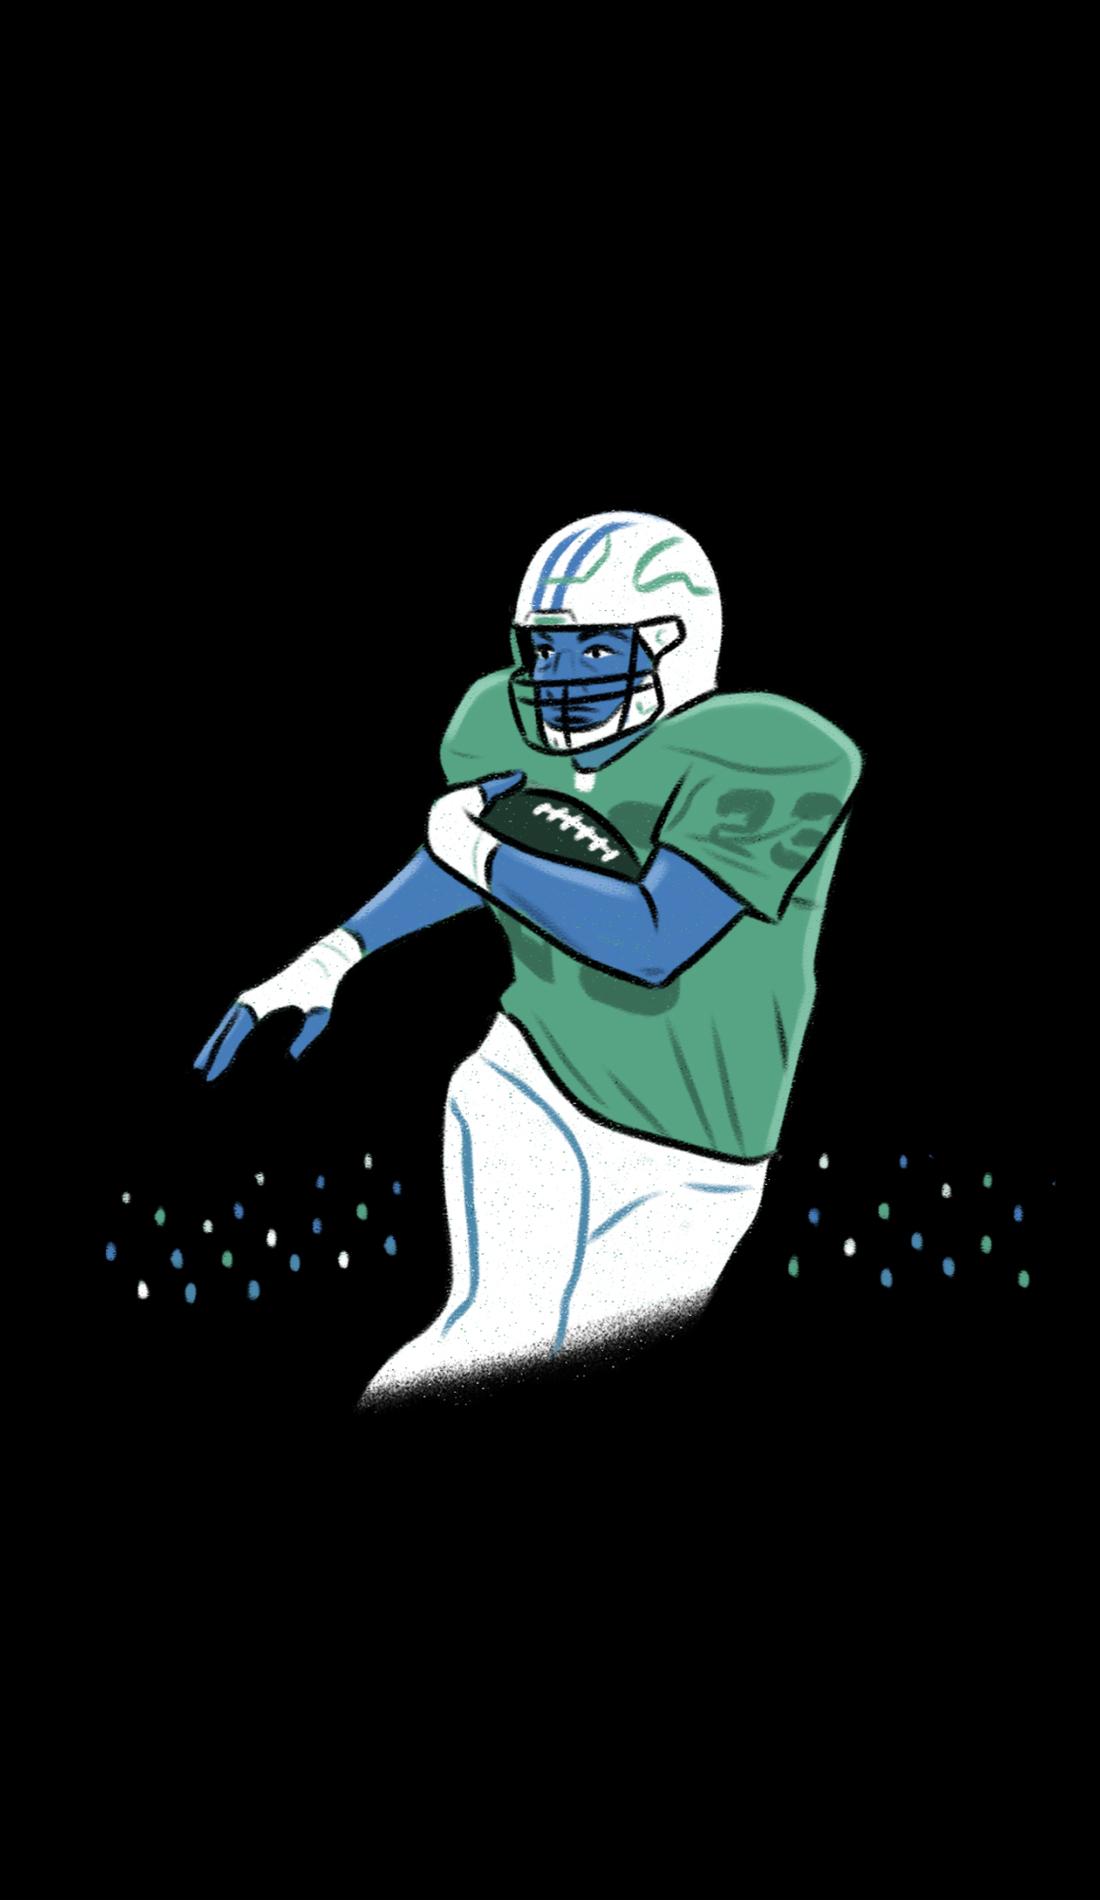 A James Madison Dukes Football live event